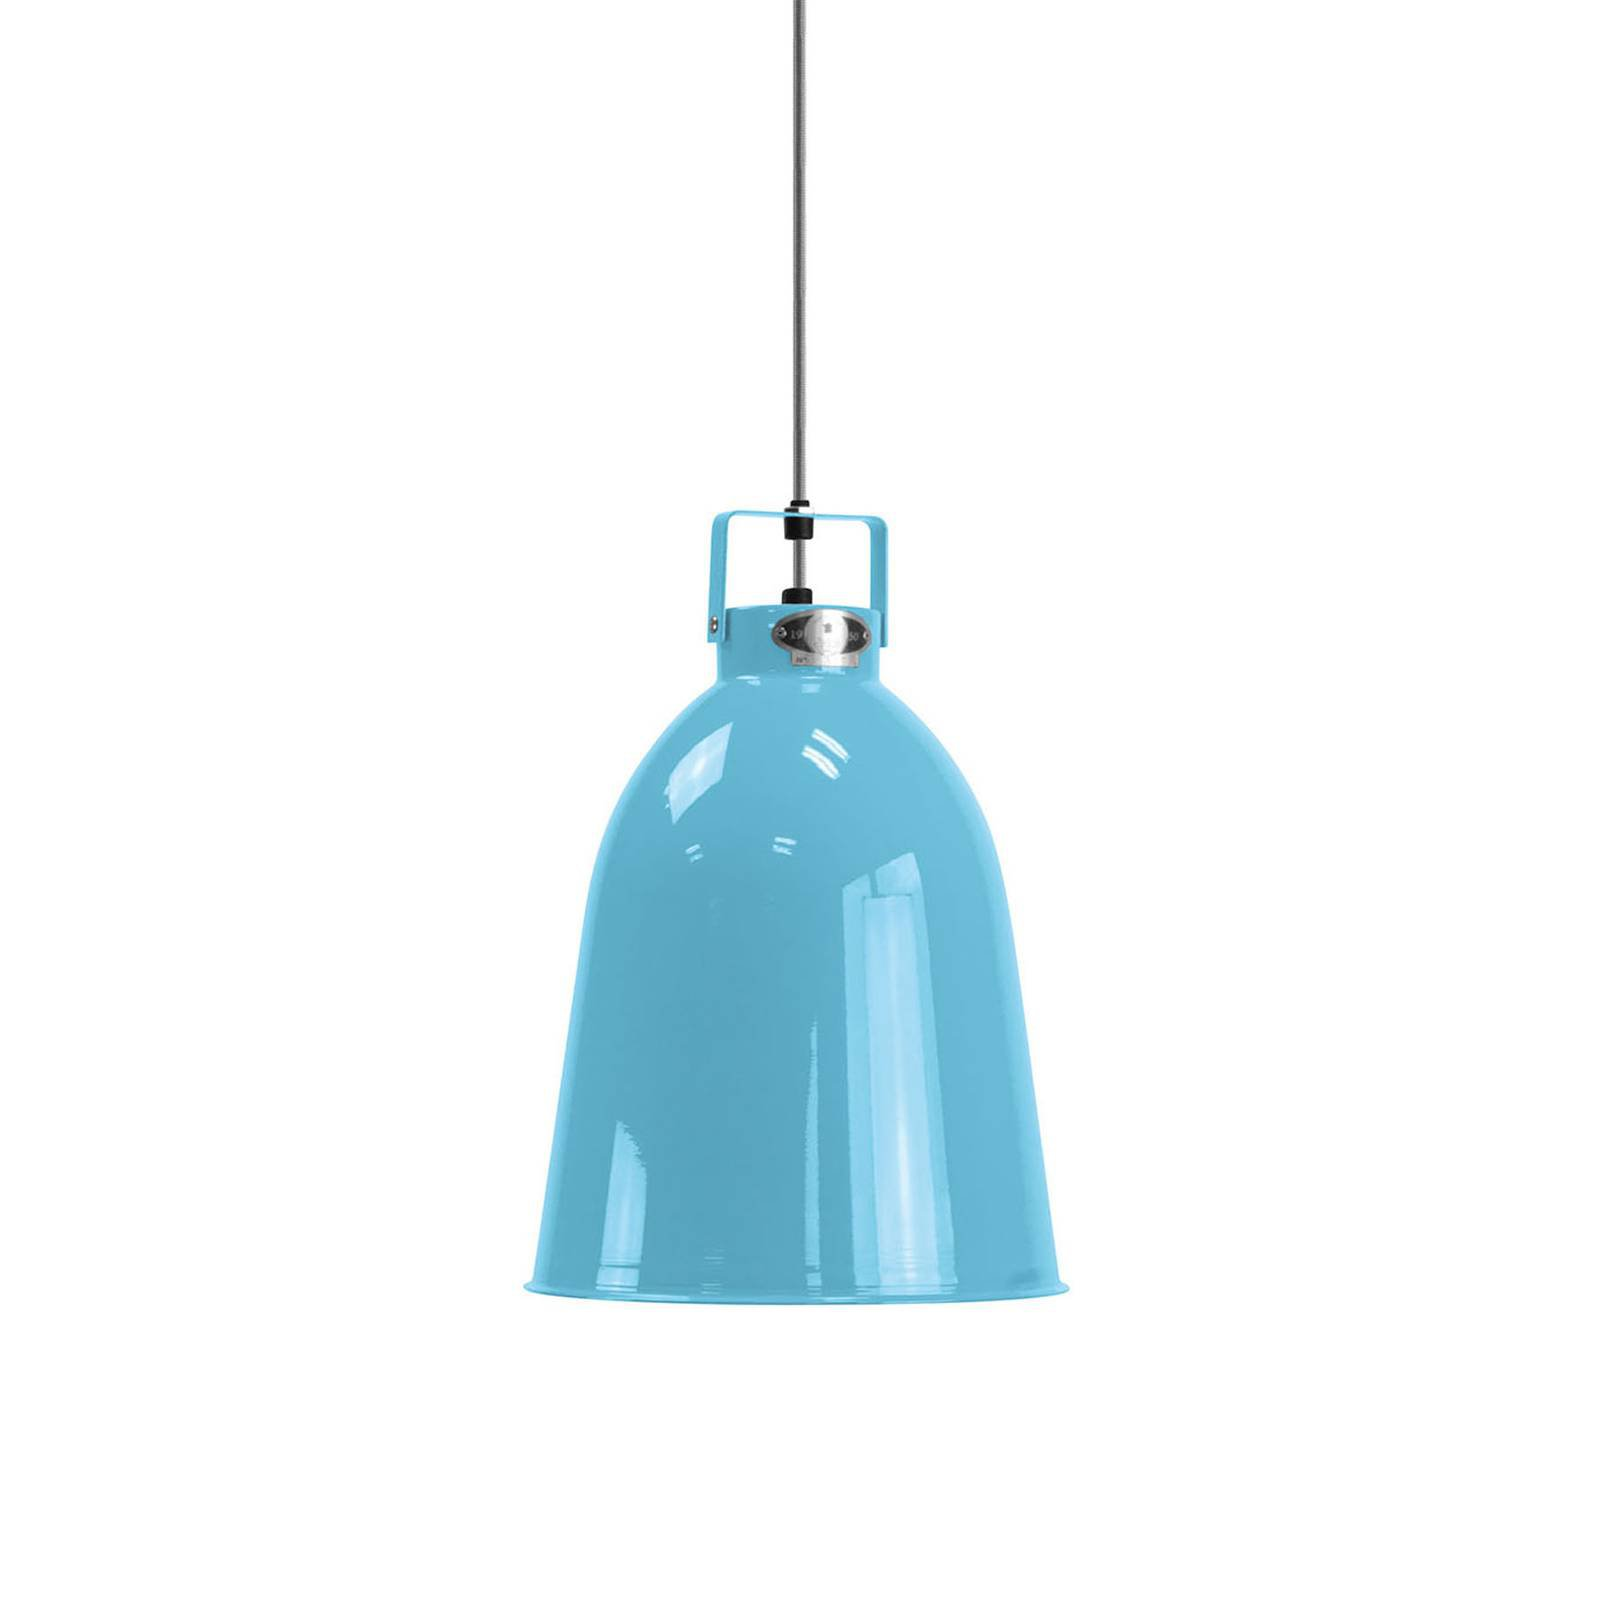 Jieldé Clément C240 hengelampe, lyseblå, Ø 24 cm